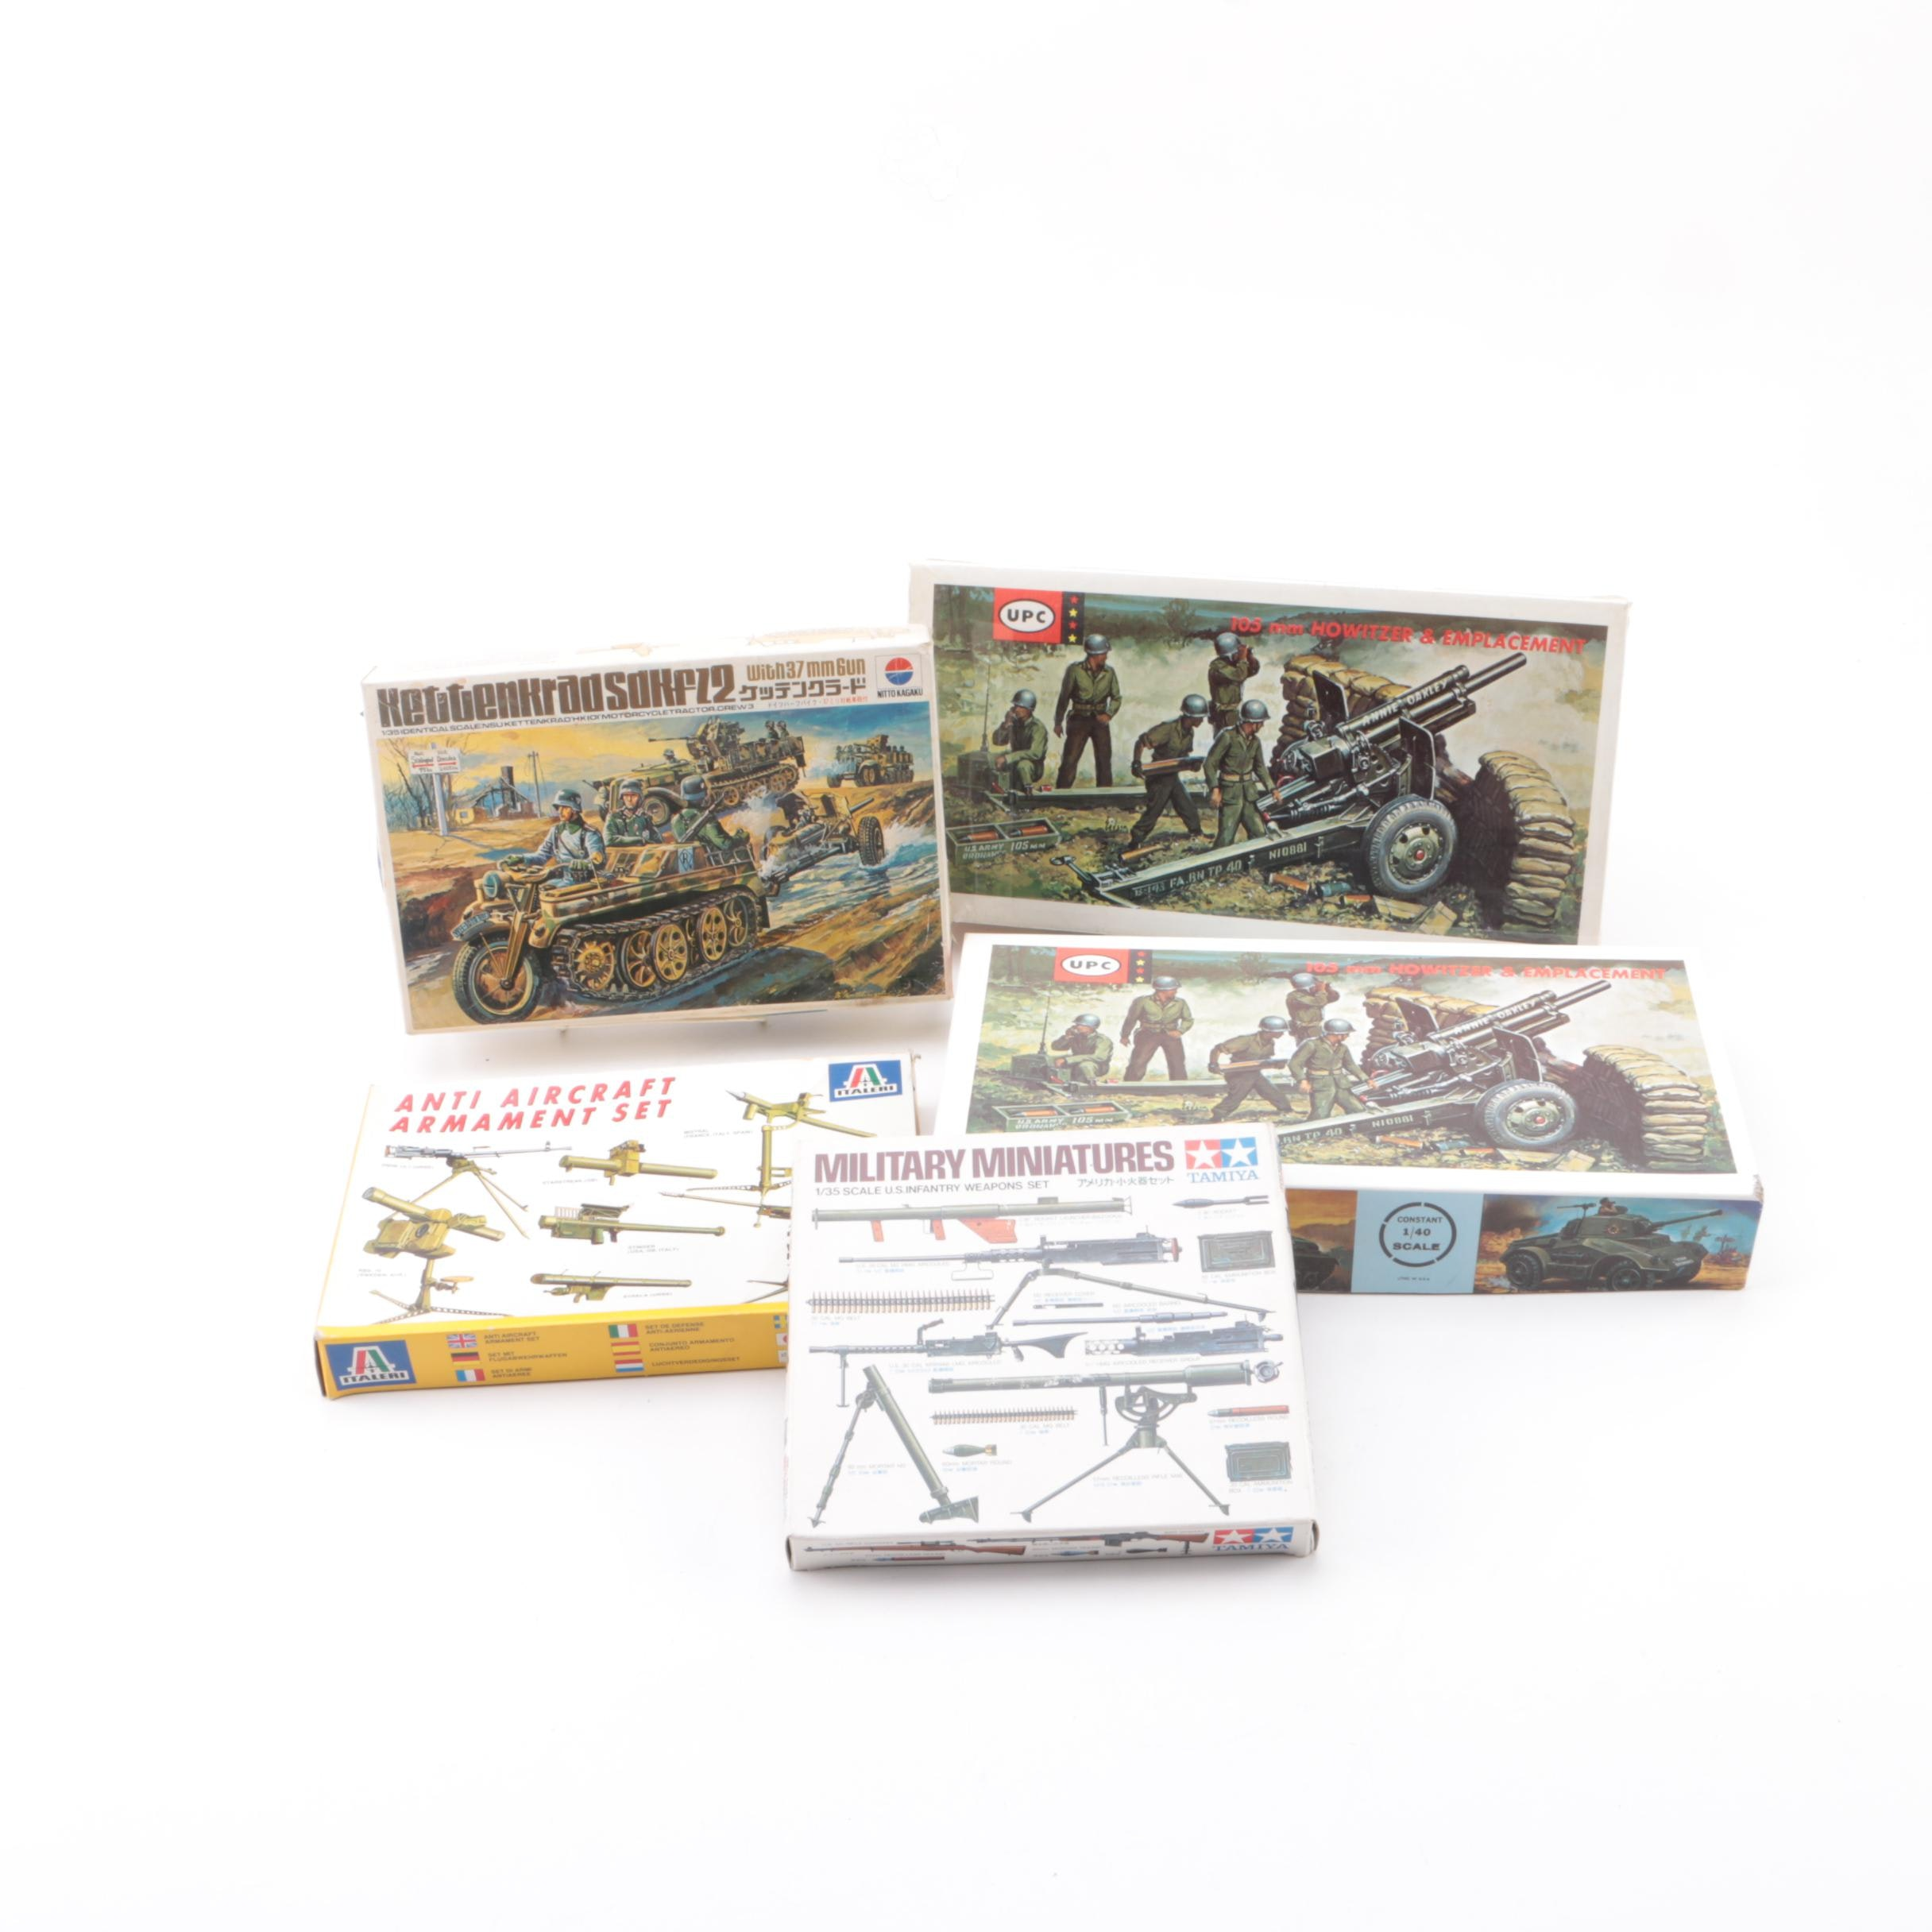 Military Vehicle and Weaponry Model Kits Including Tamiya